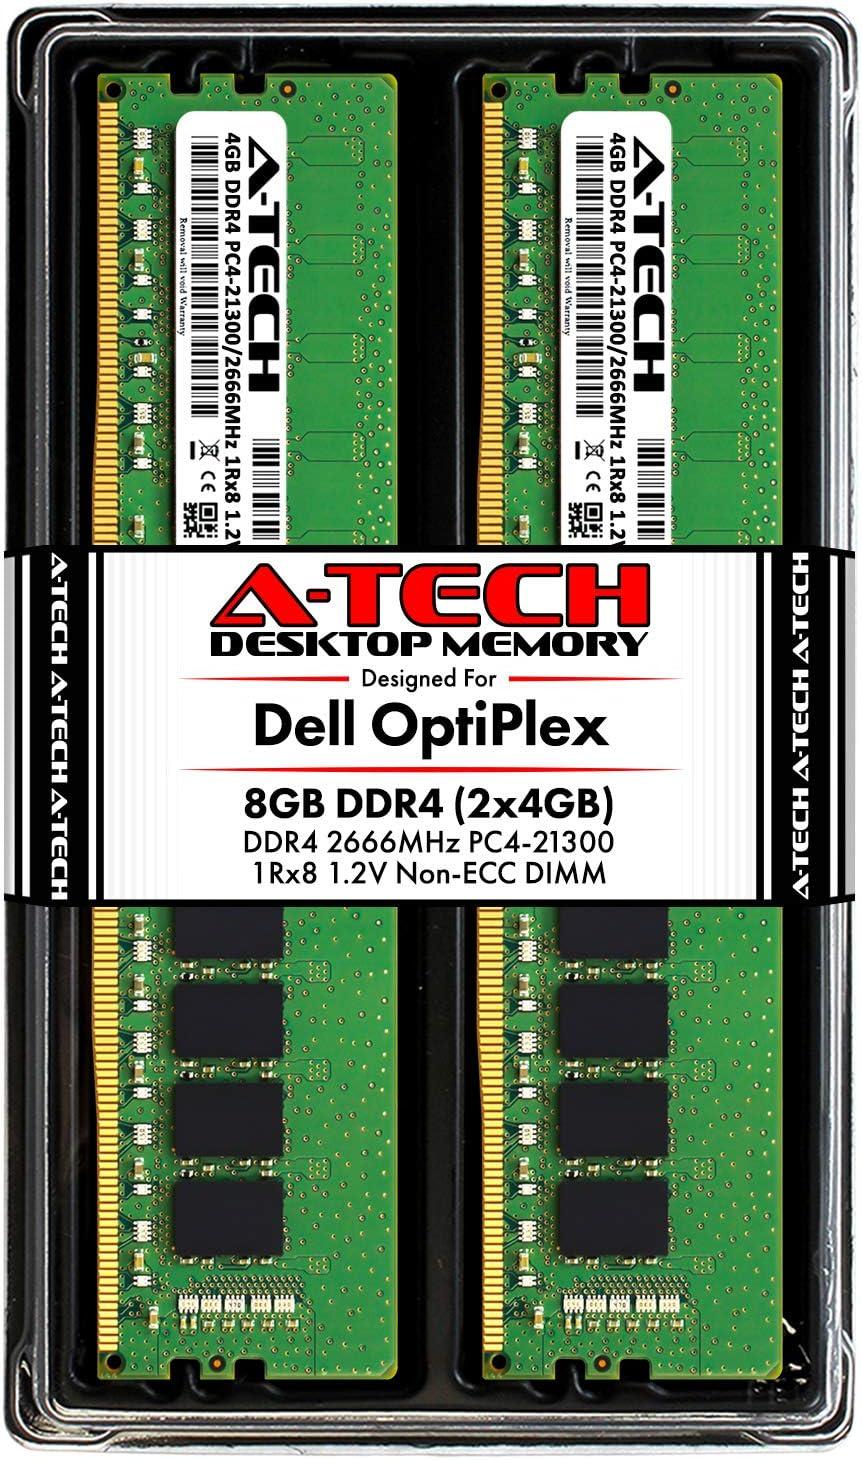 A-Tech 8GB RAM Kit for Dell OptiPlex XE3, 7070, 7060, 5070, 5060, 3070, 3060, Tower/SFF - (2 x 4GB) DDR4 2666MHz PC4-21300 Non-ECC DIMM Desktop Memory Upgrade